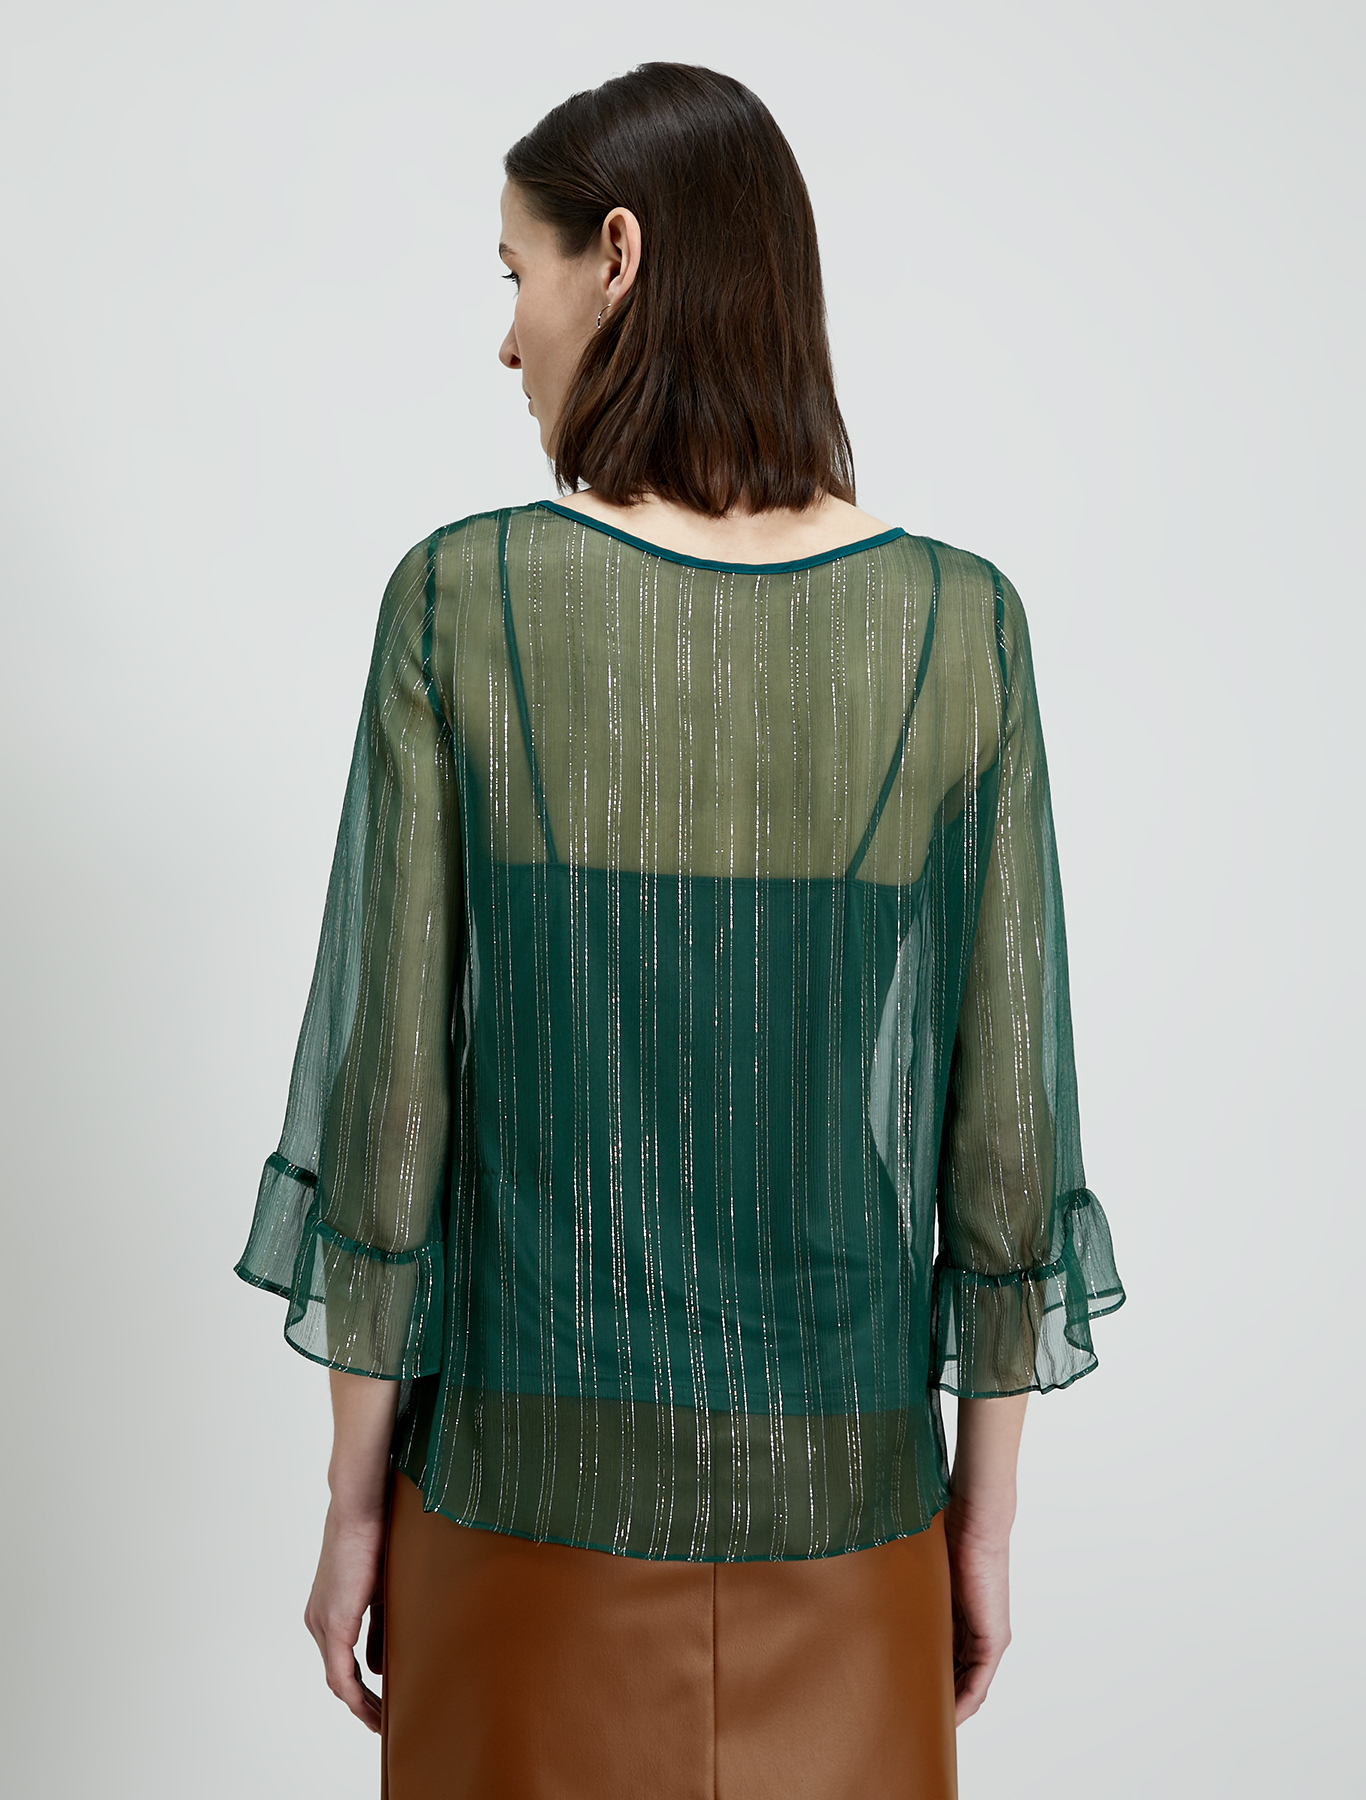 Blouse in lamé silk - green - pennyblack